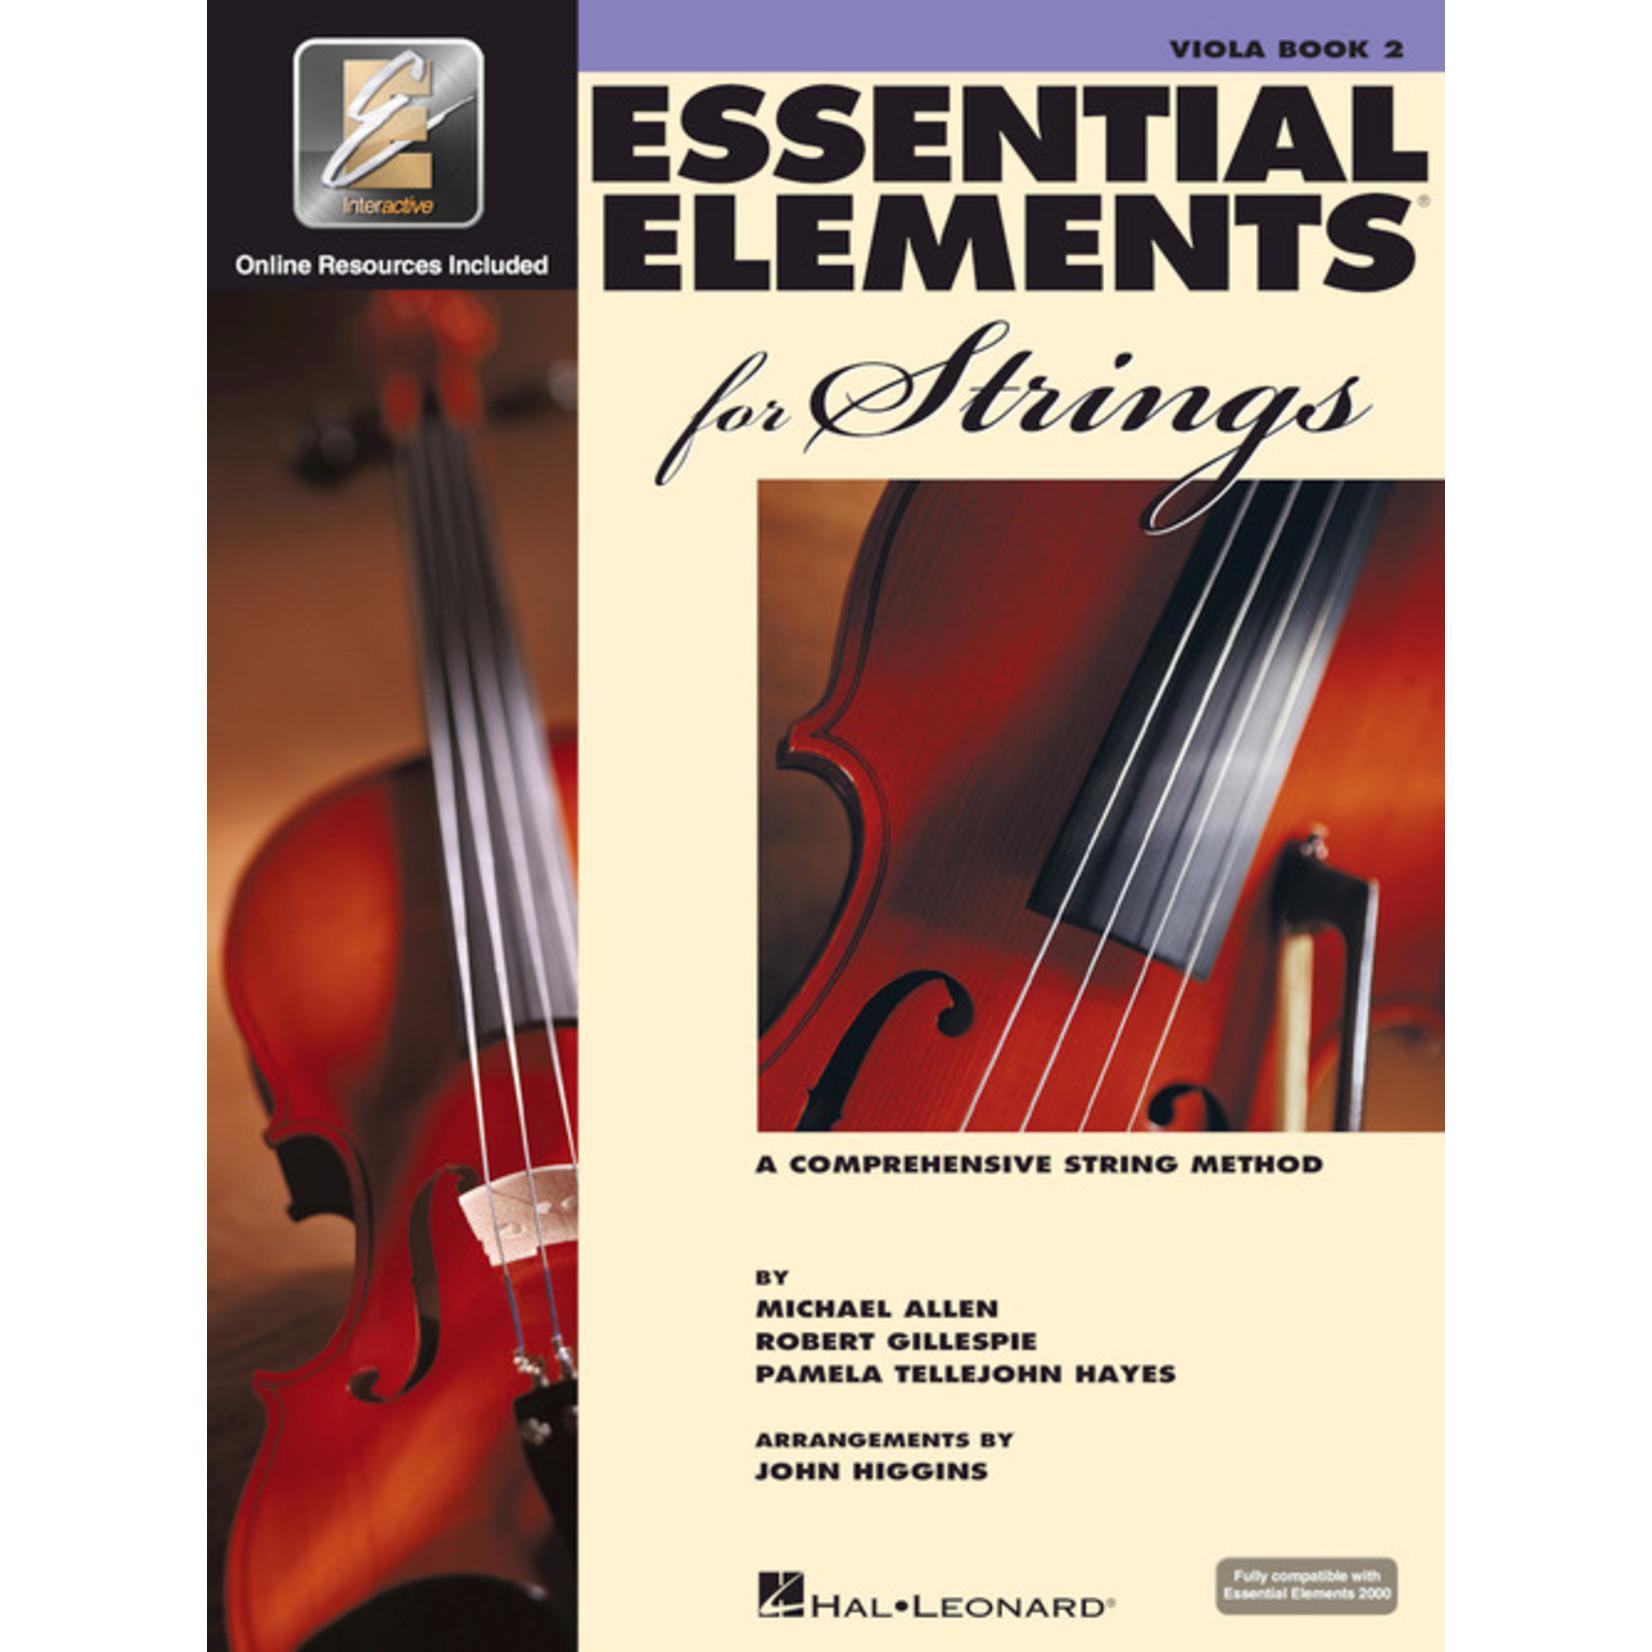 Hal Leonard Essential Elements for Strings Viola Book 2